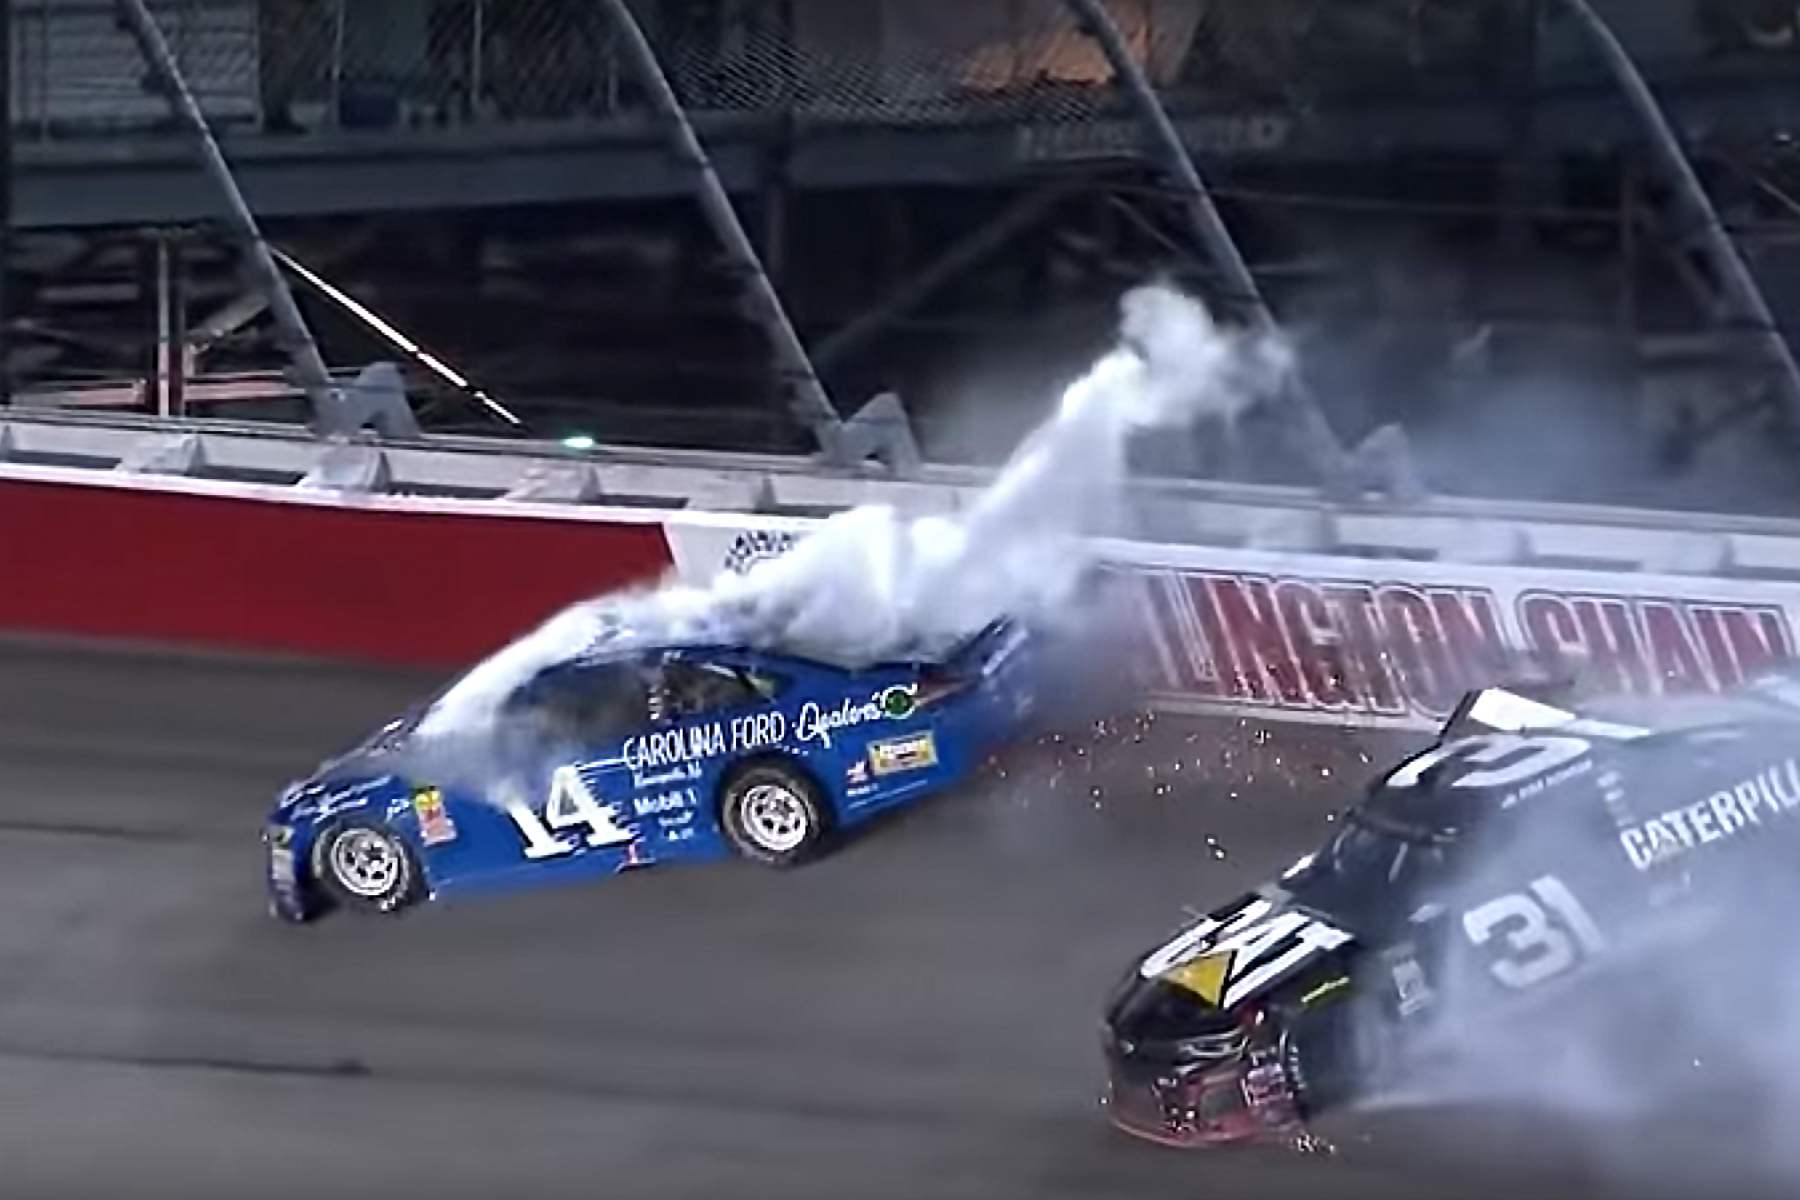 Clint Bowyer and Ryan Newman crash at Darlington Raceway